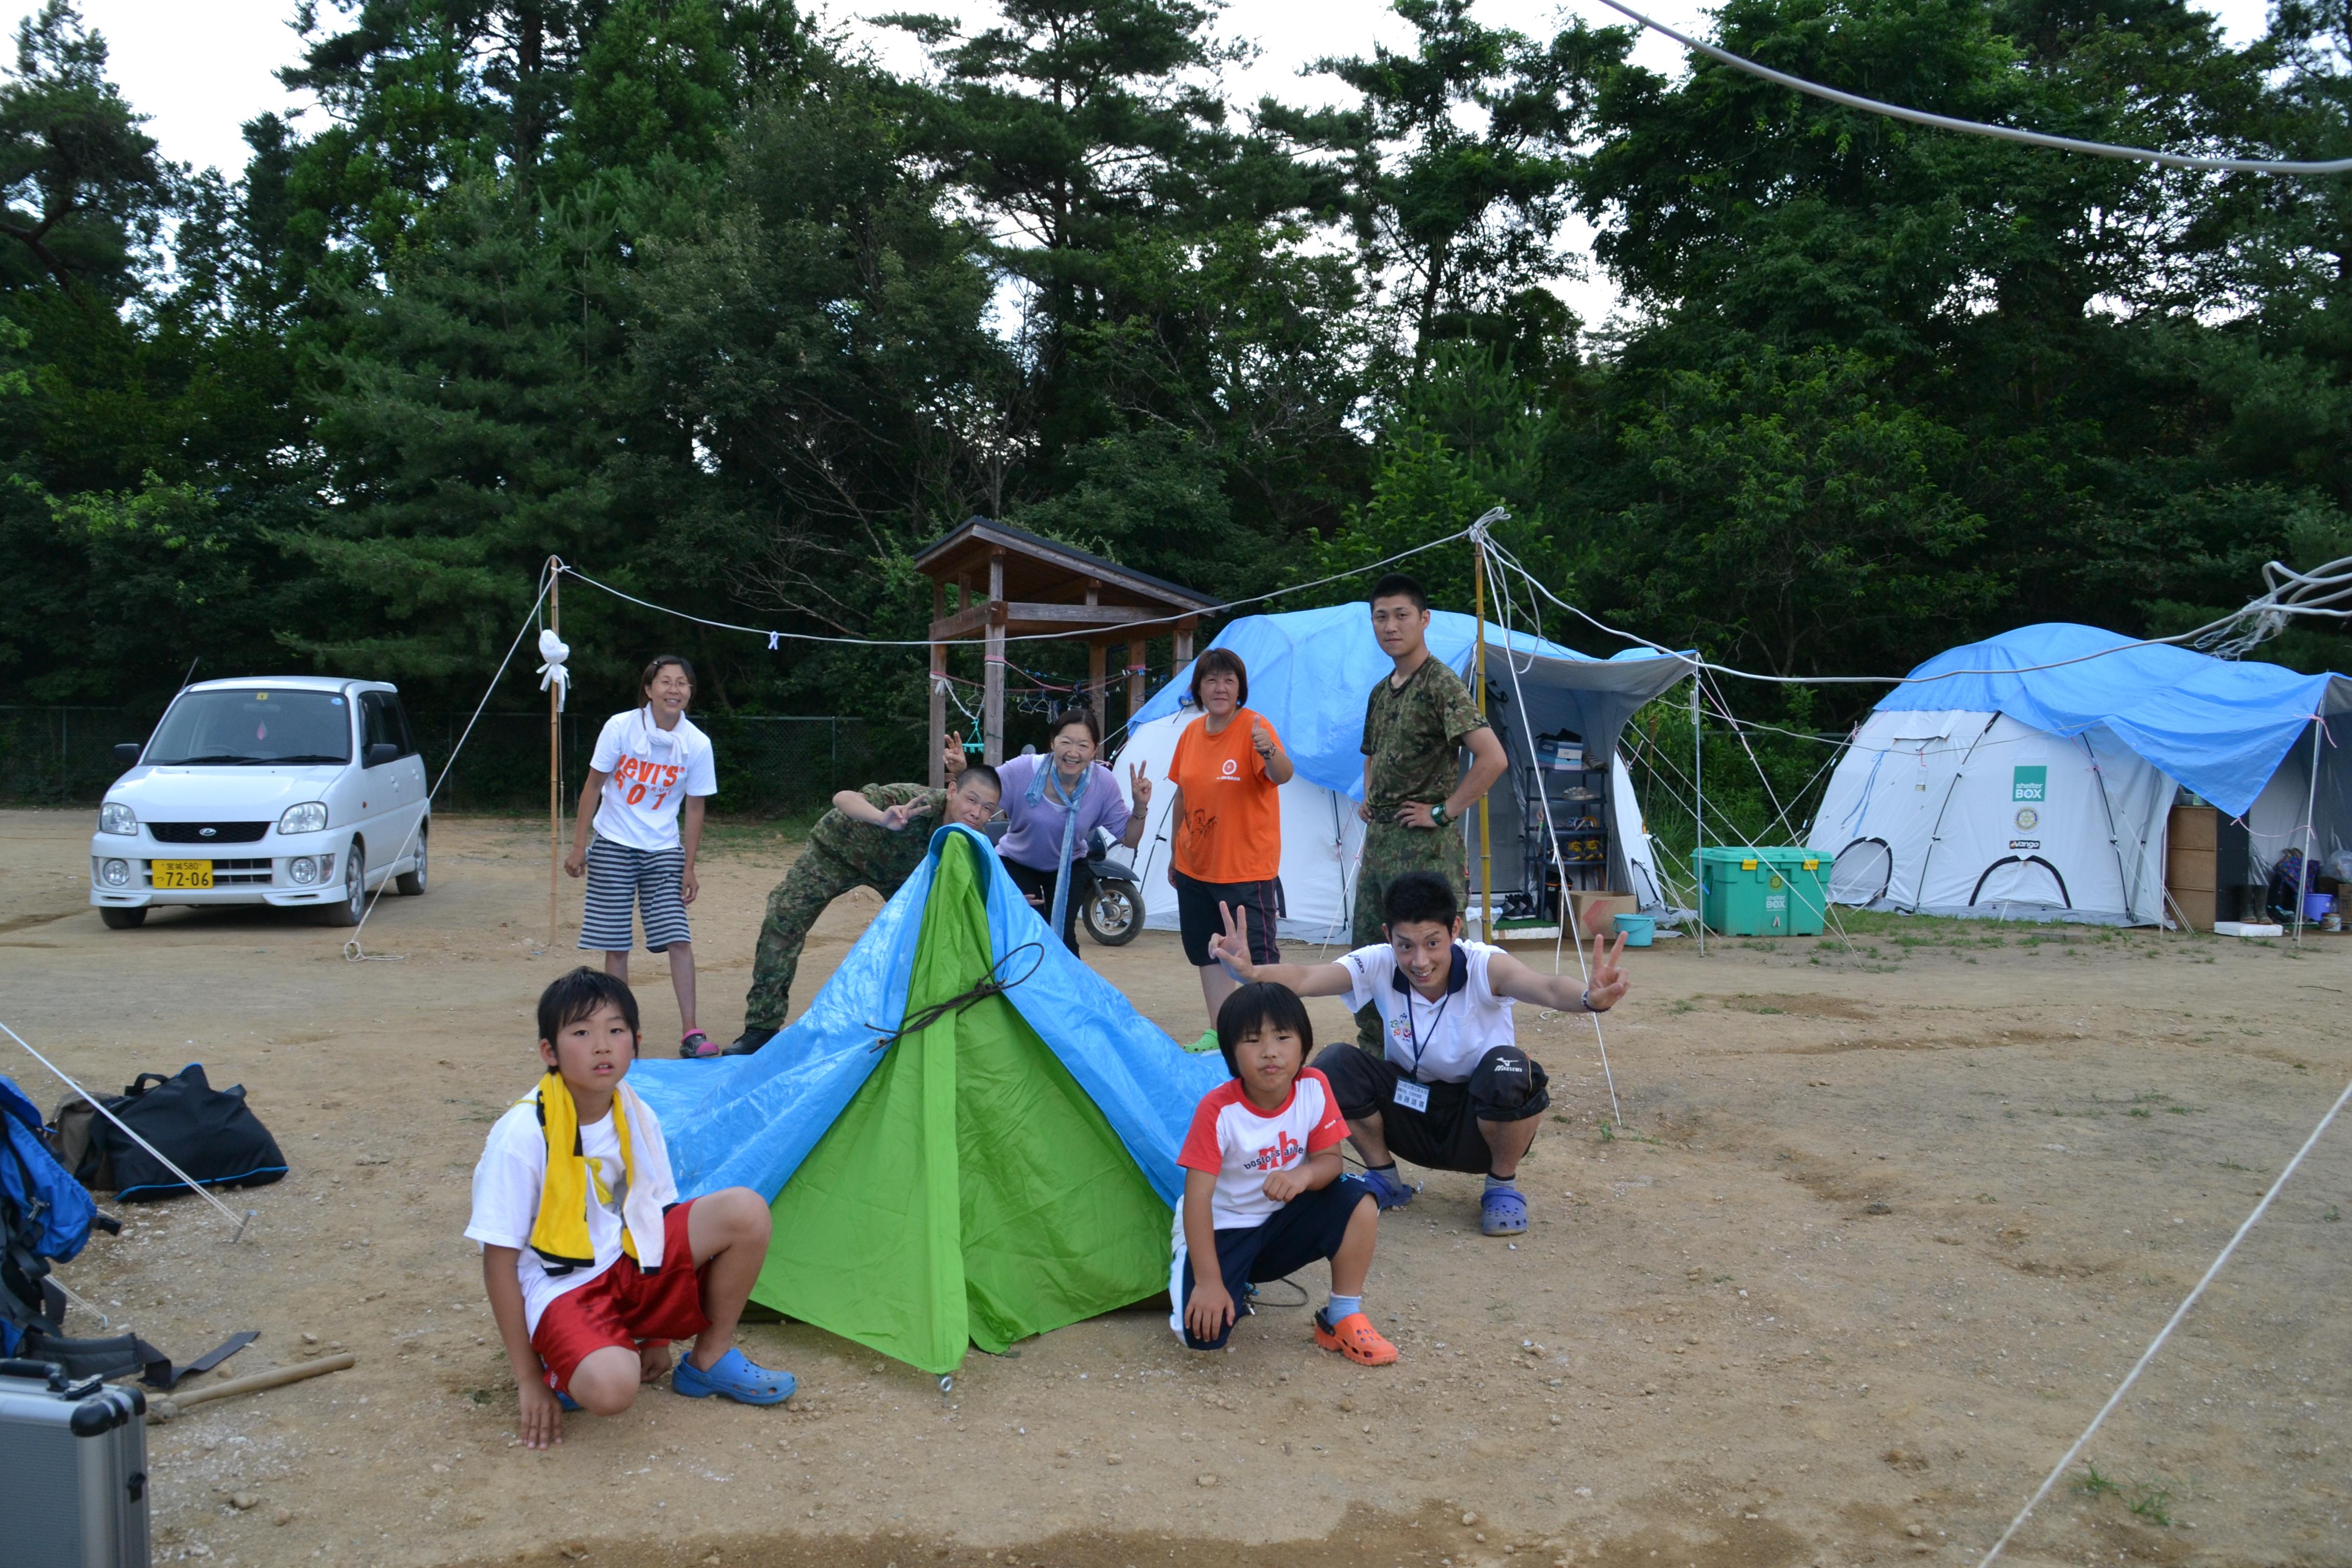 onagawa tent city with families, Jeitai, linda.JPG